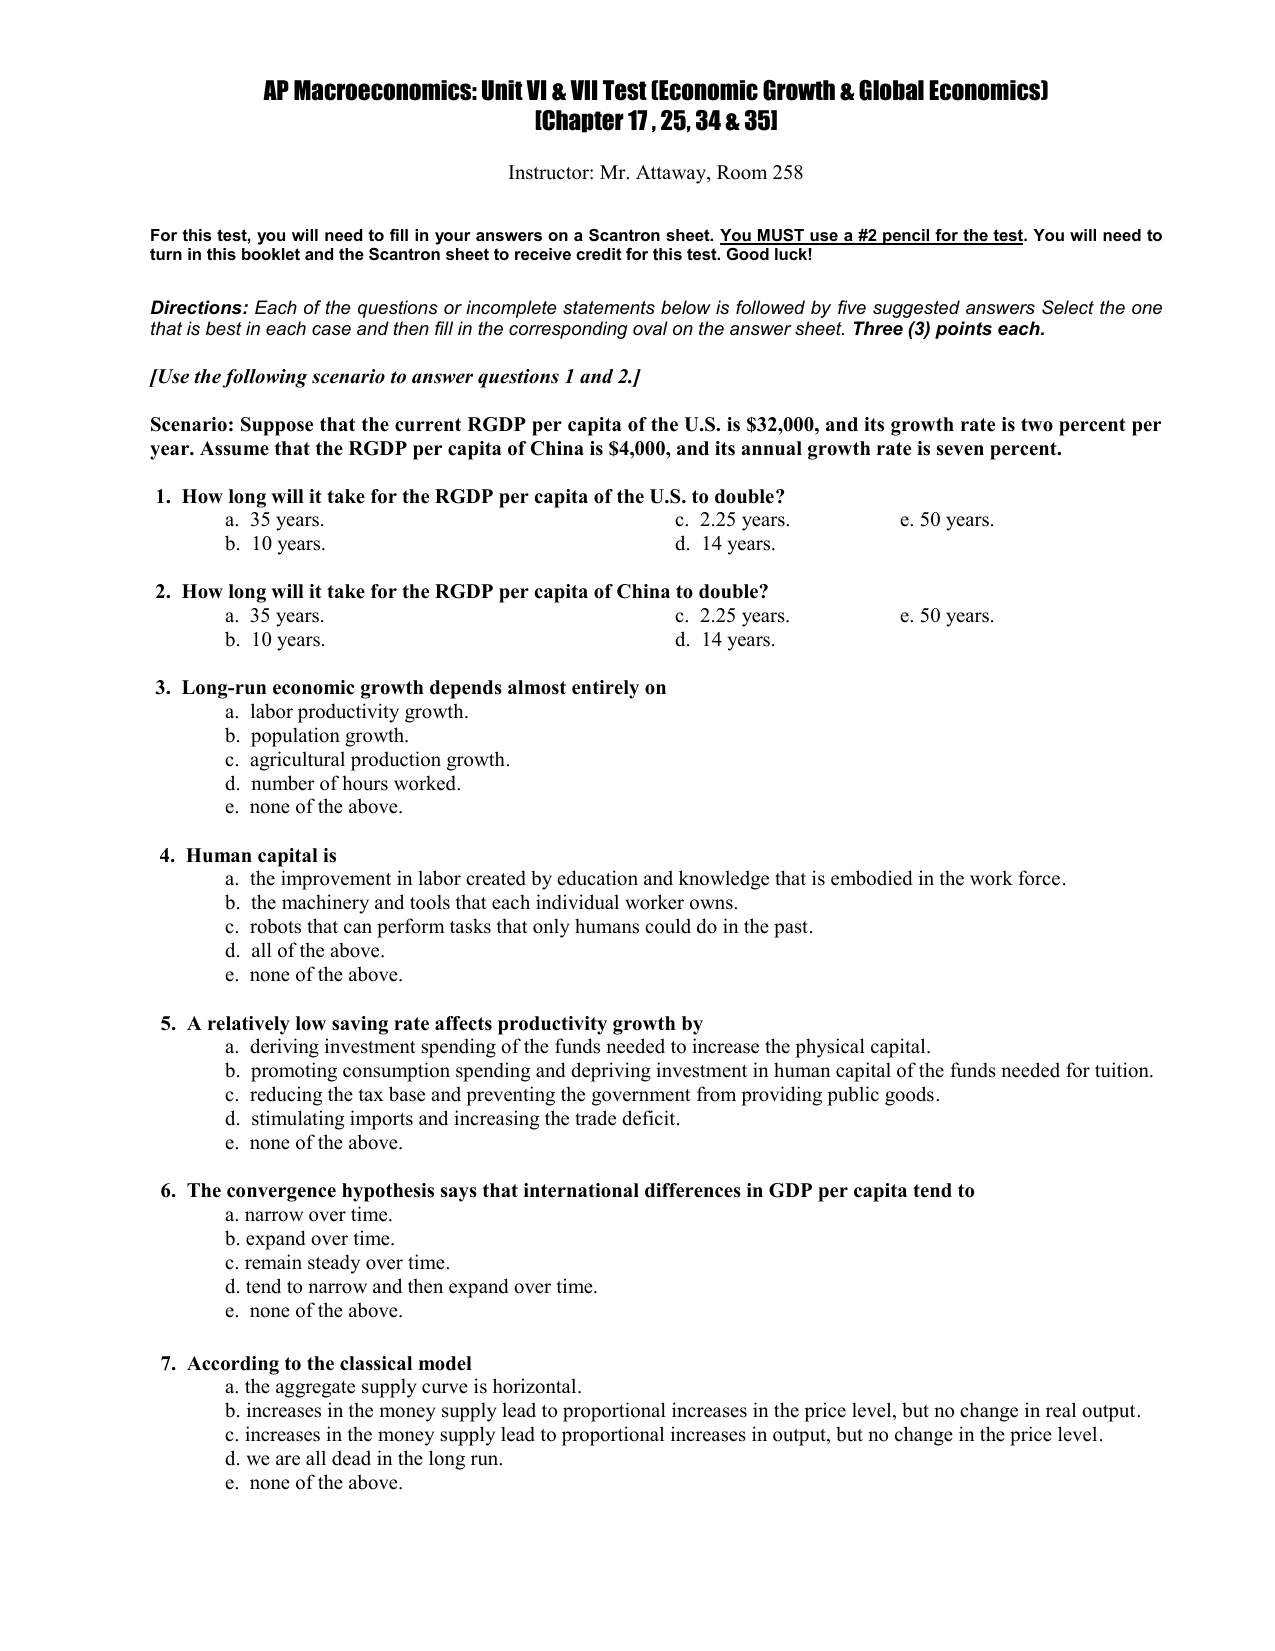 AP Macroeconomics: Unit V Test (Chapters 17-20)